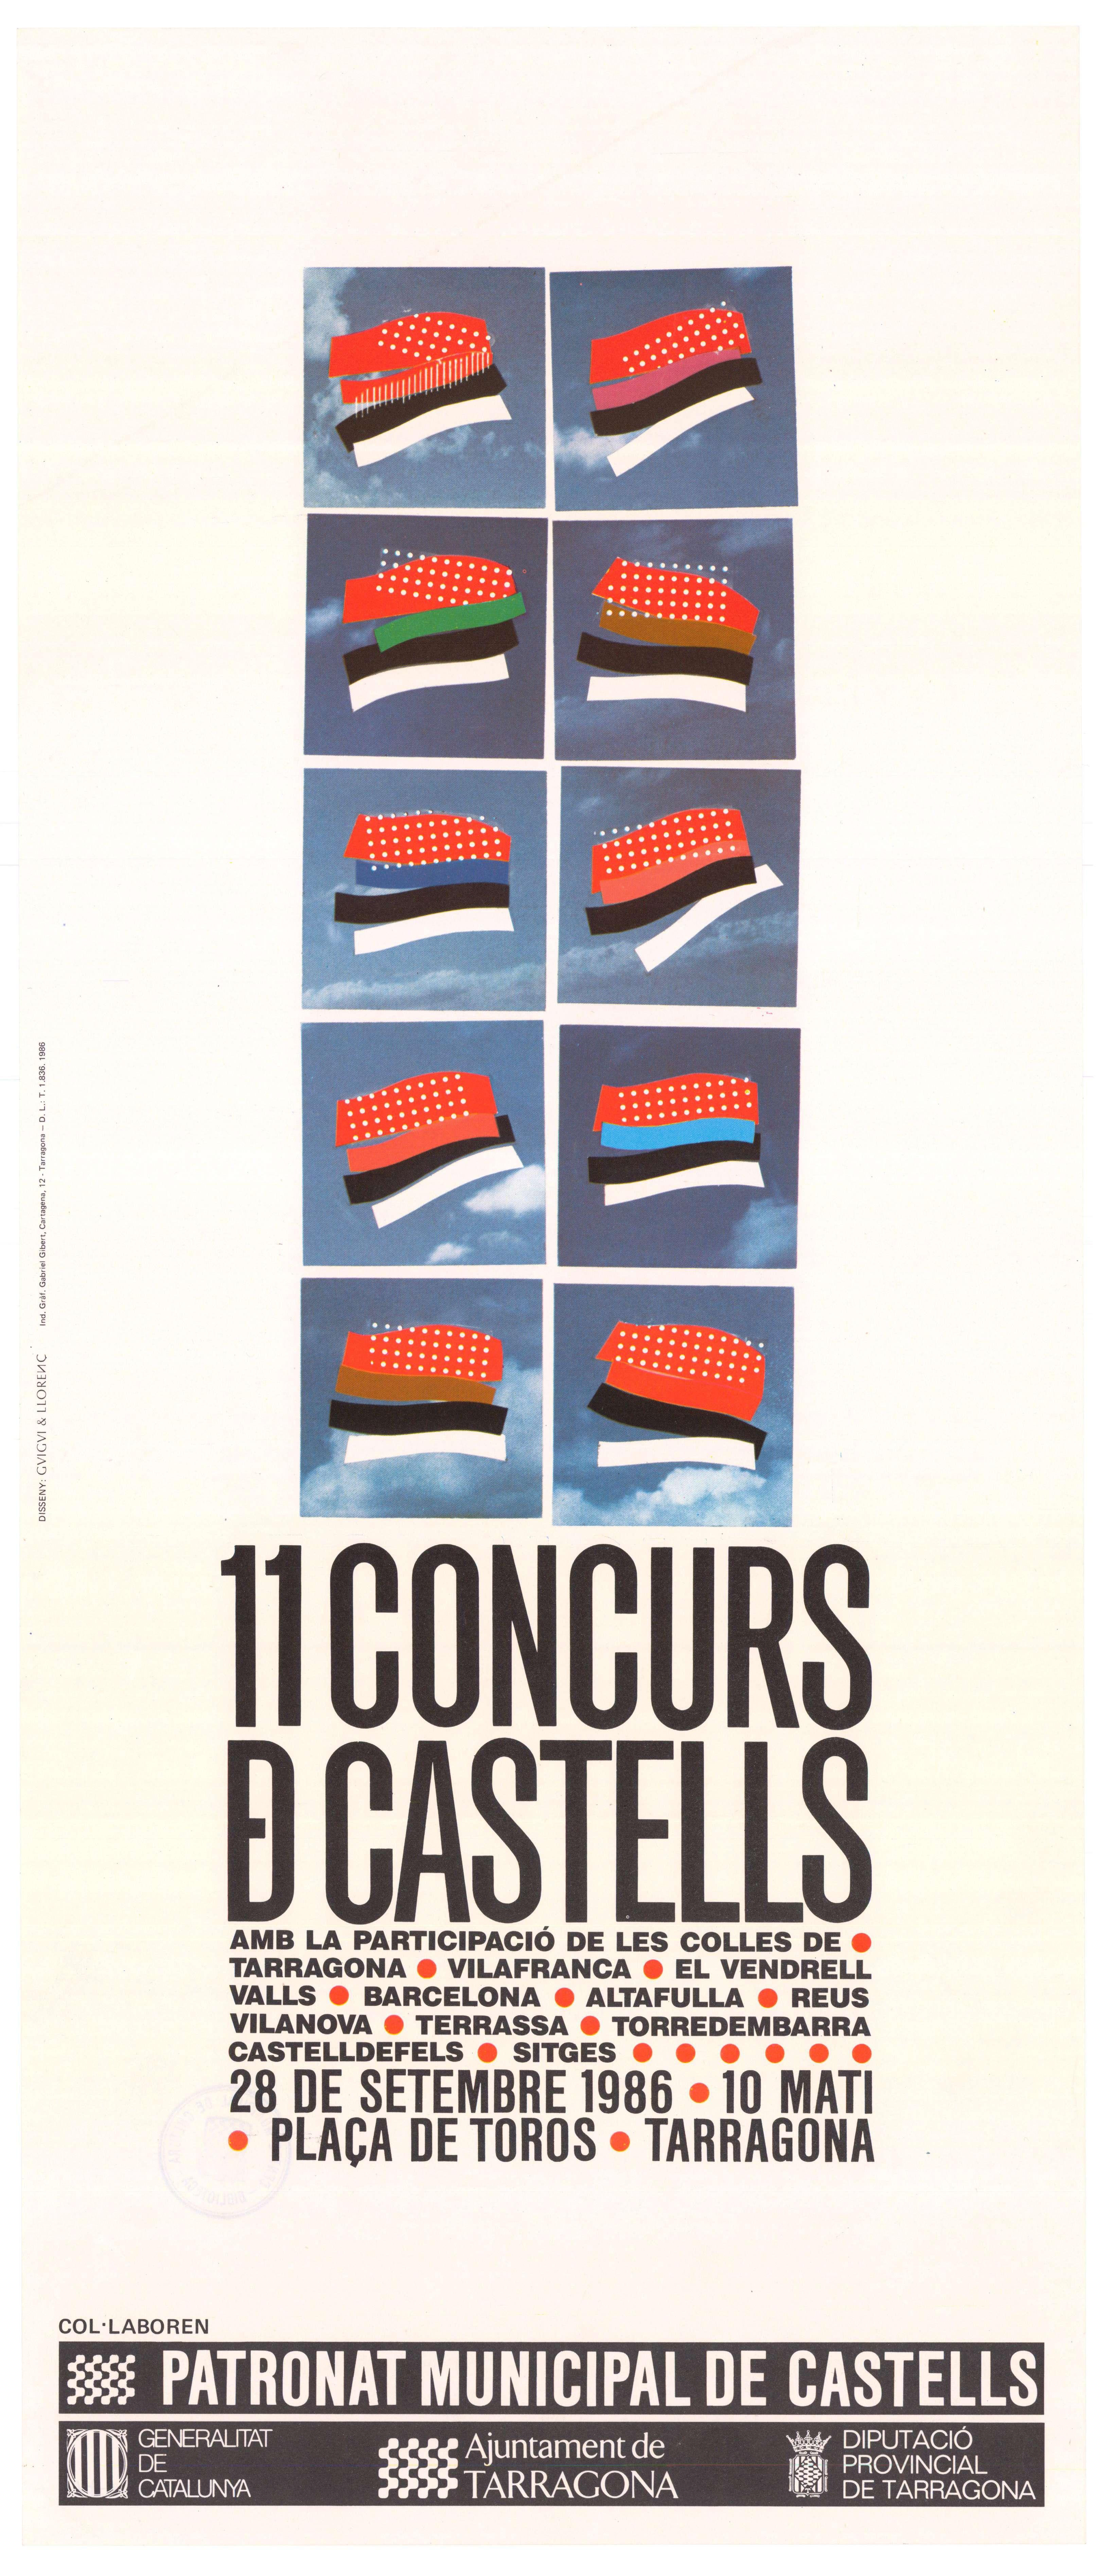 https://tgnblog.tarragona.cat/wp-content/uploads/2014/05/Cartell-Concurs-de-Castells_1986-baix.jpg